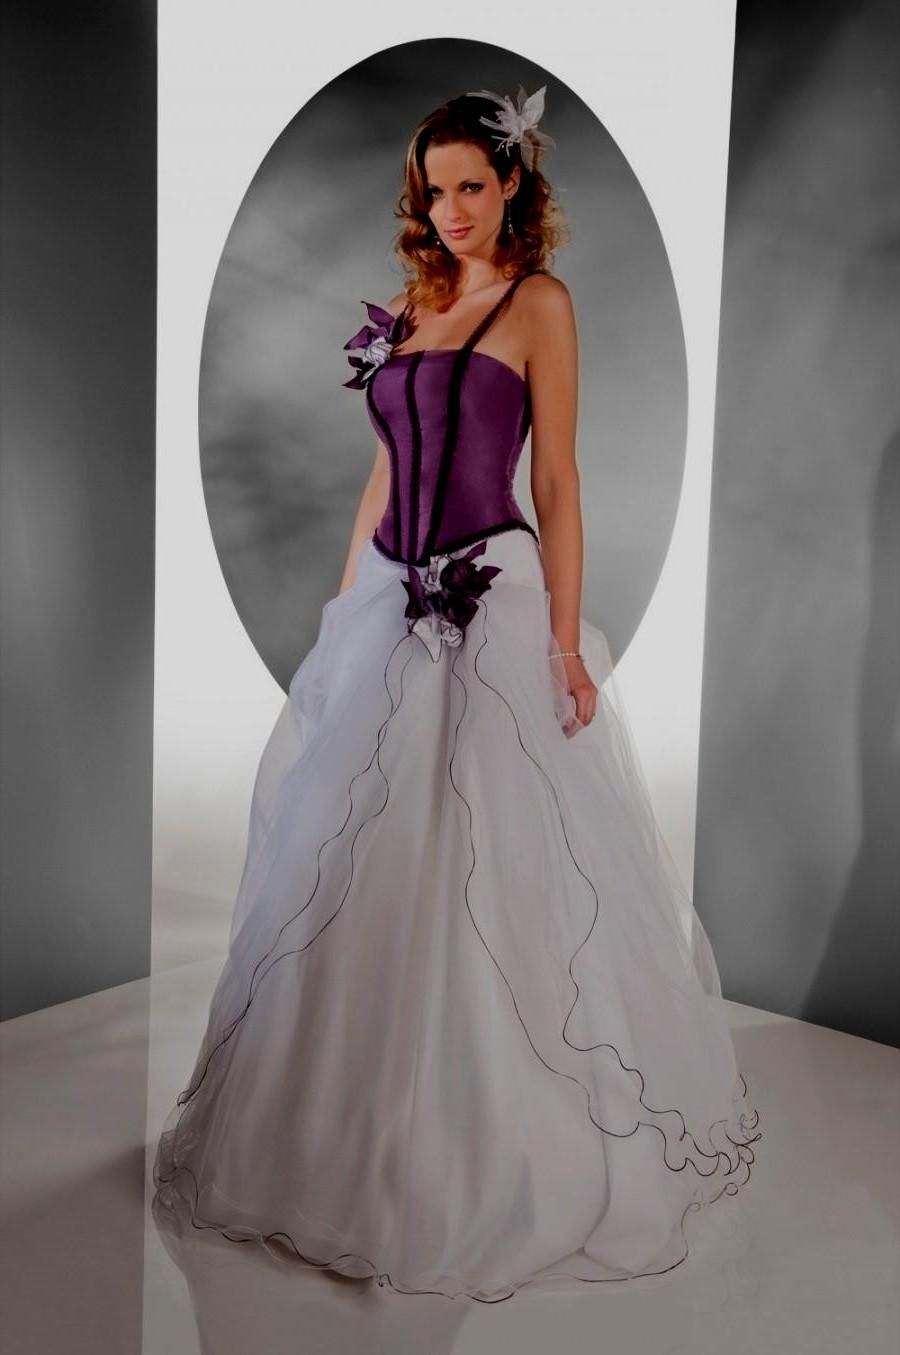 Purple And White Wedding Dresses Best White Dresses 9018742 Jpg